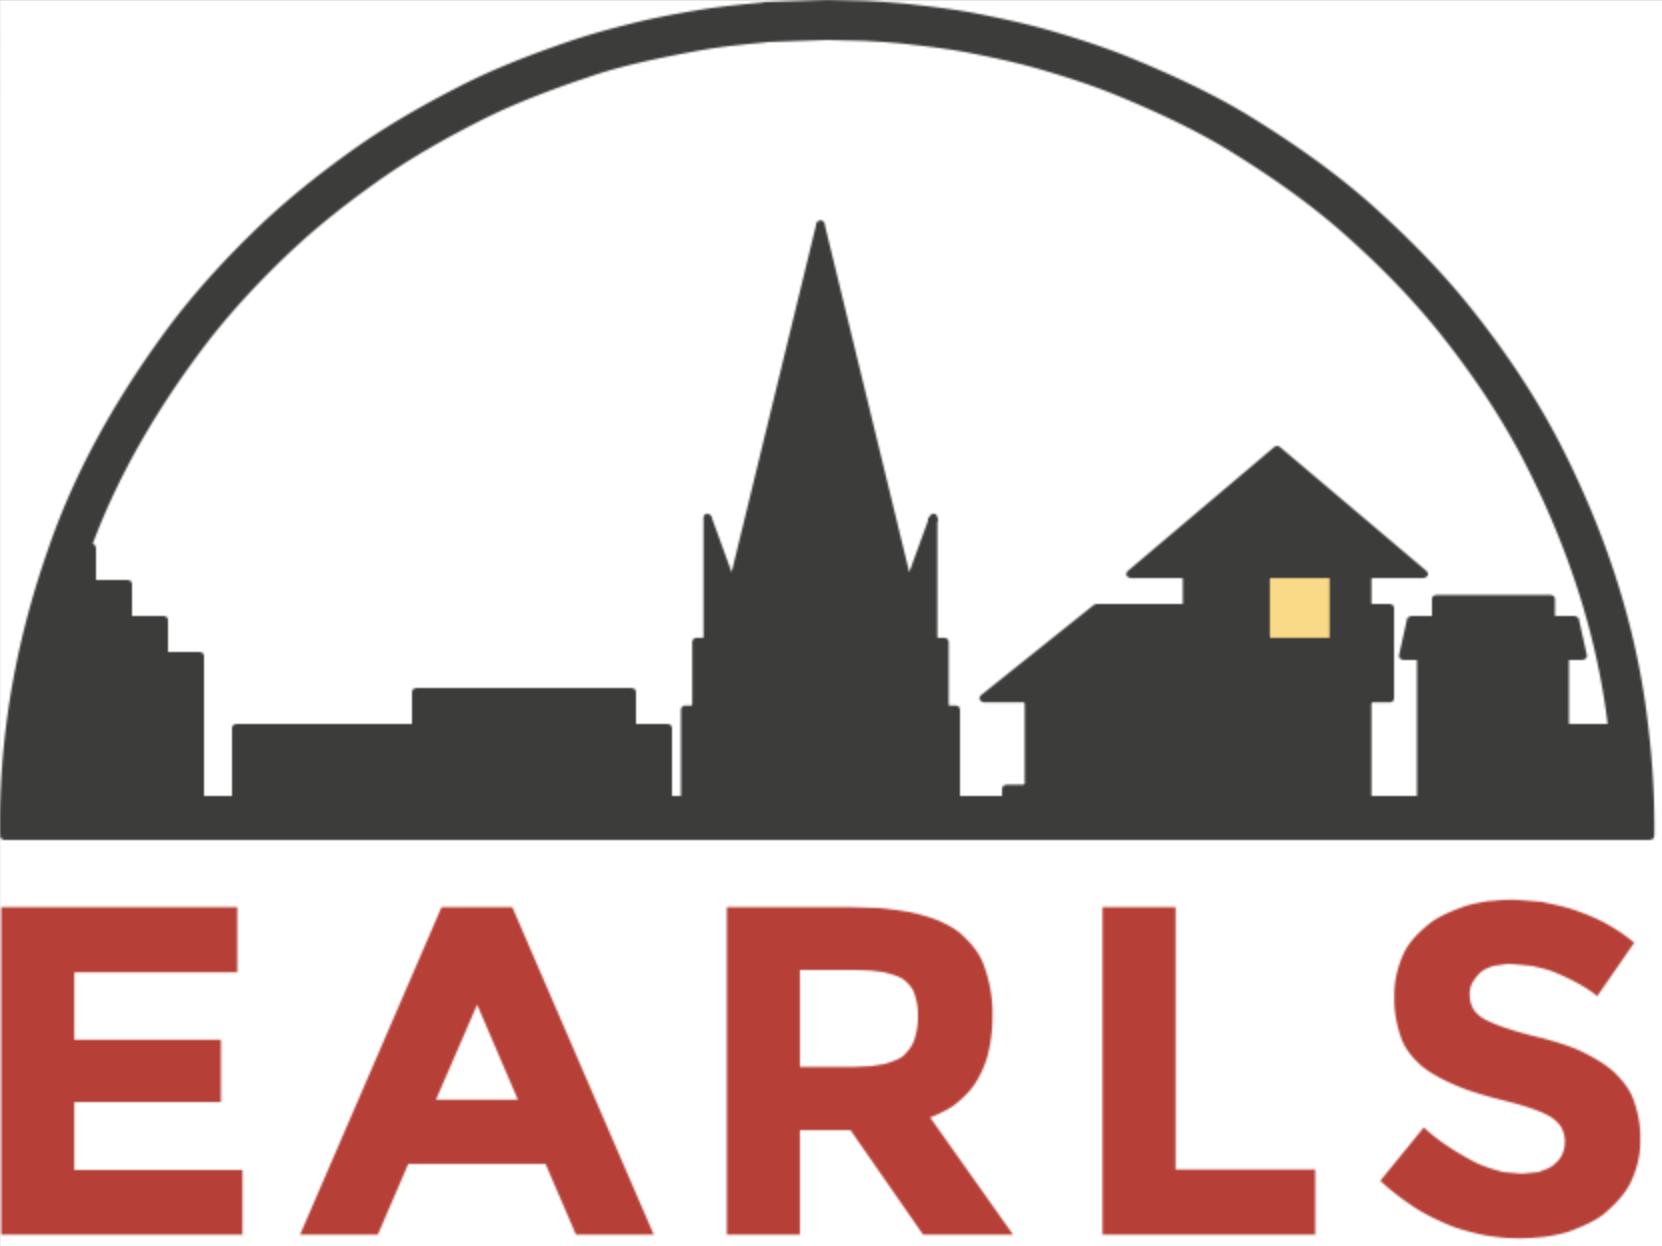 EARLS